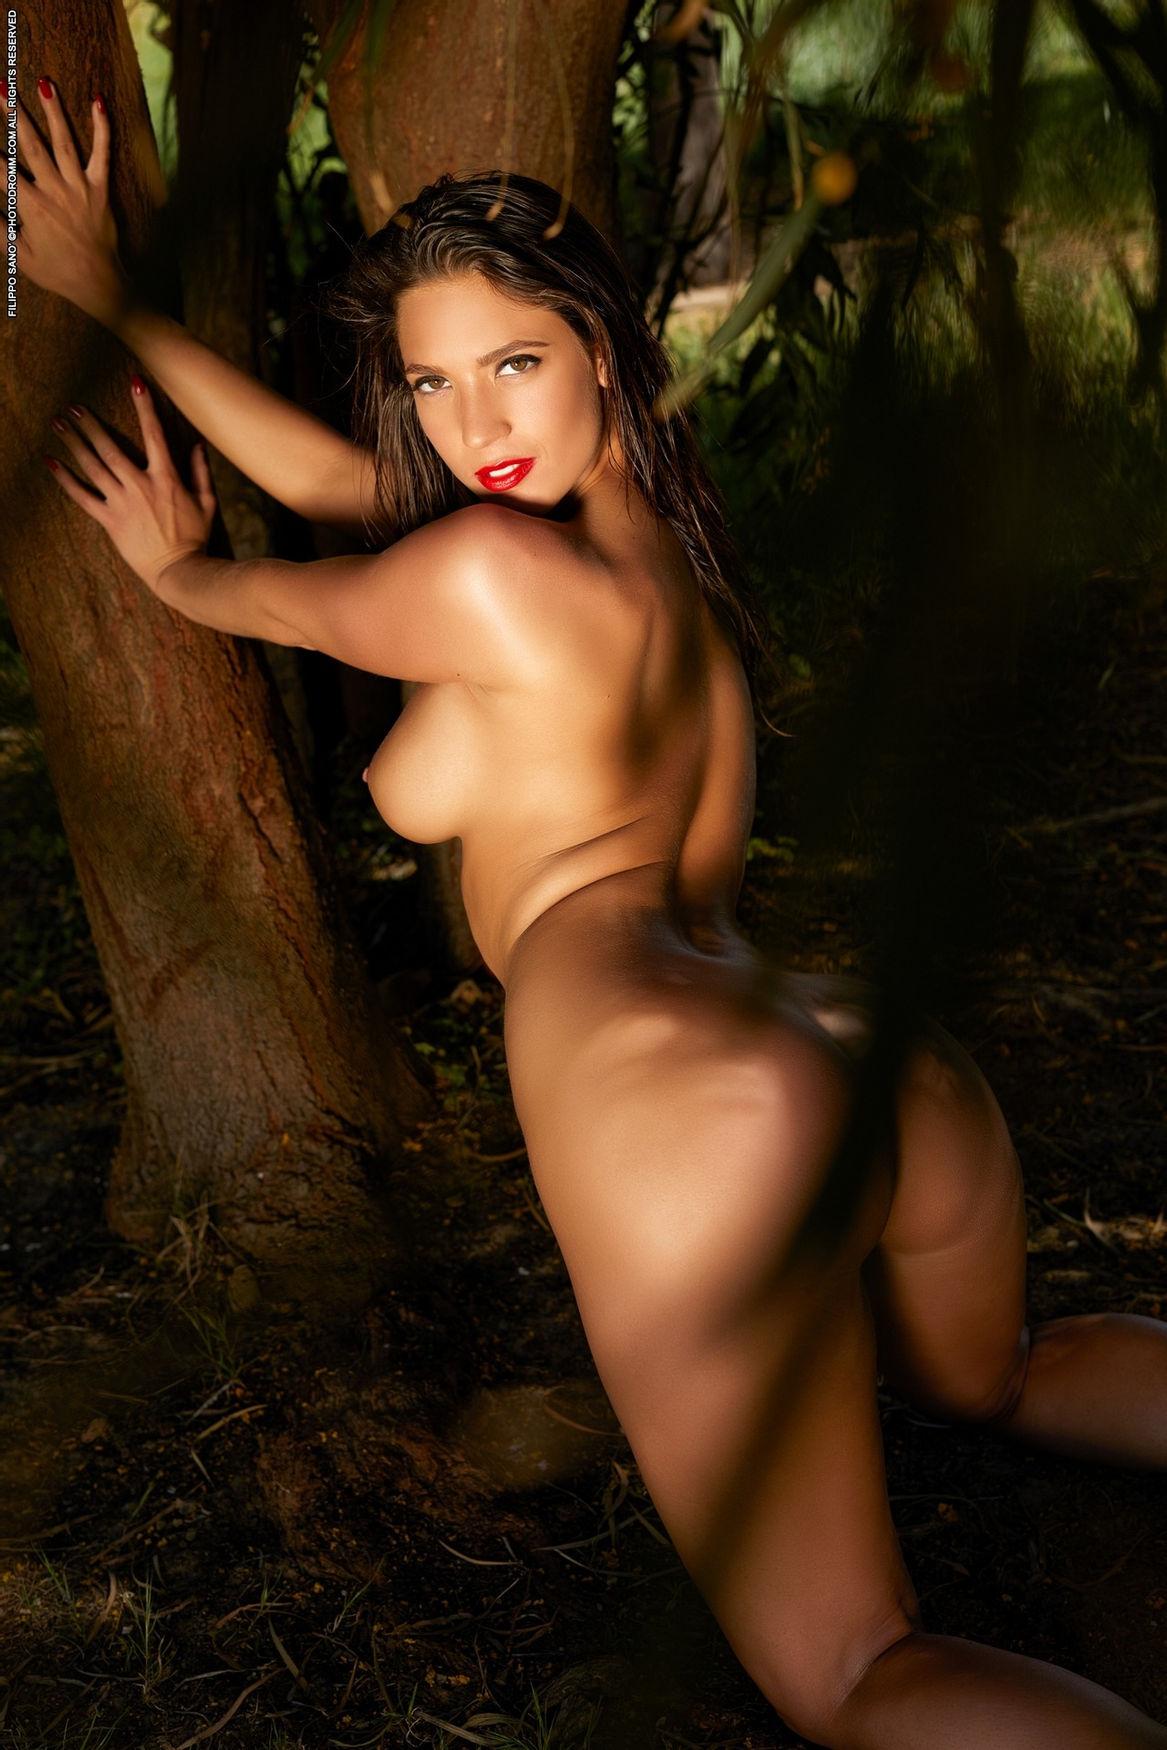 Love to thrust my pelvic on her 😈